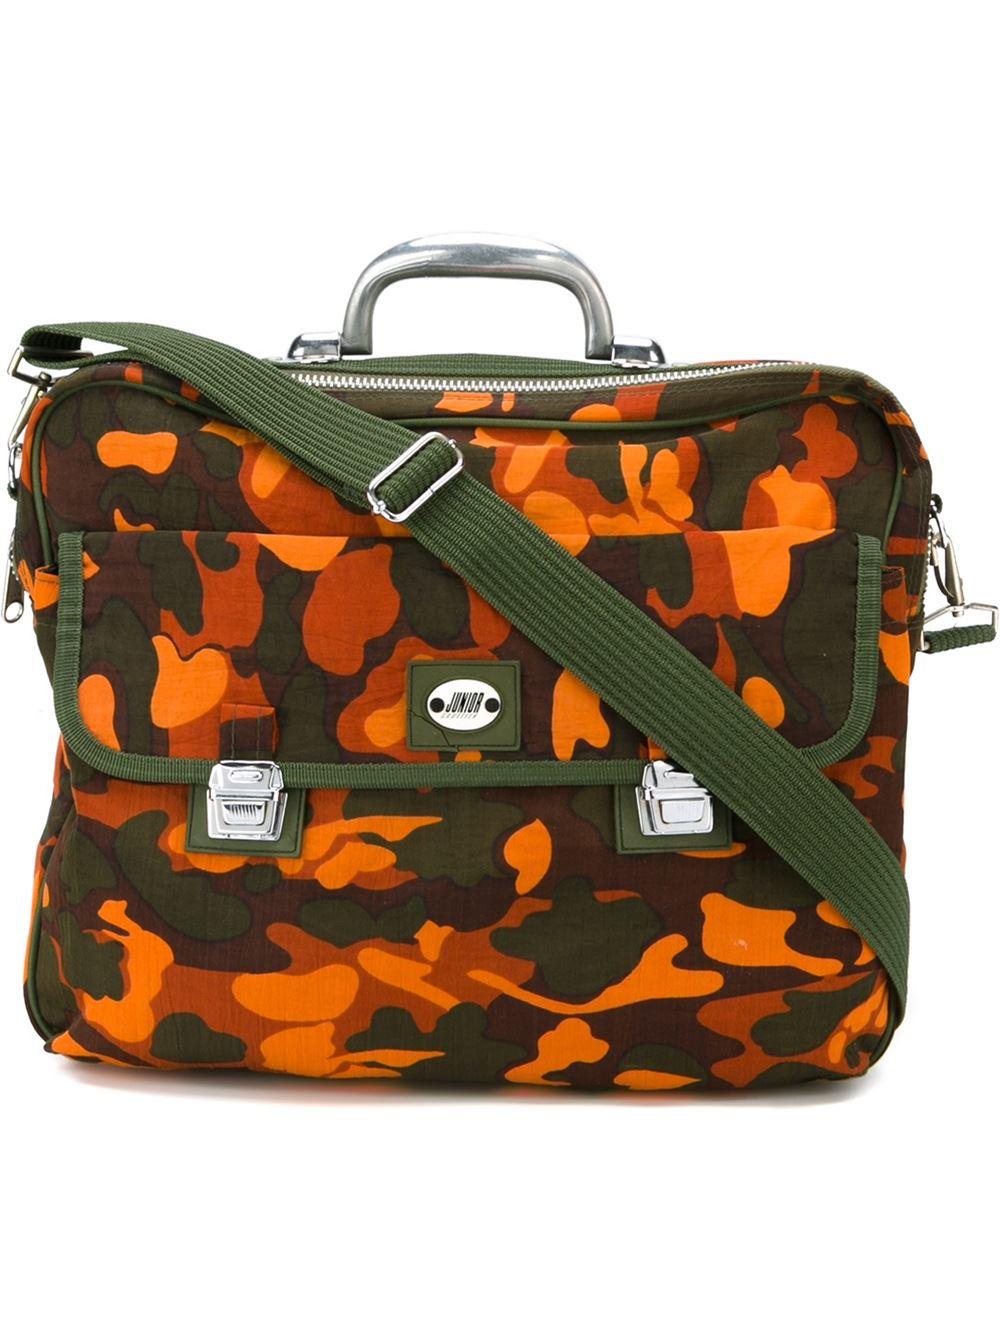 Lyst - Jean Paul Gaultier Camouflage Shoulder Bag in Green for Men a9c7735ec3